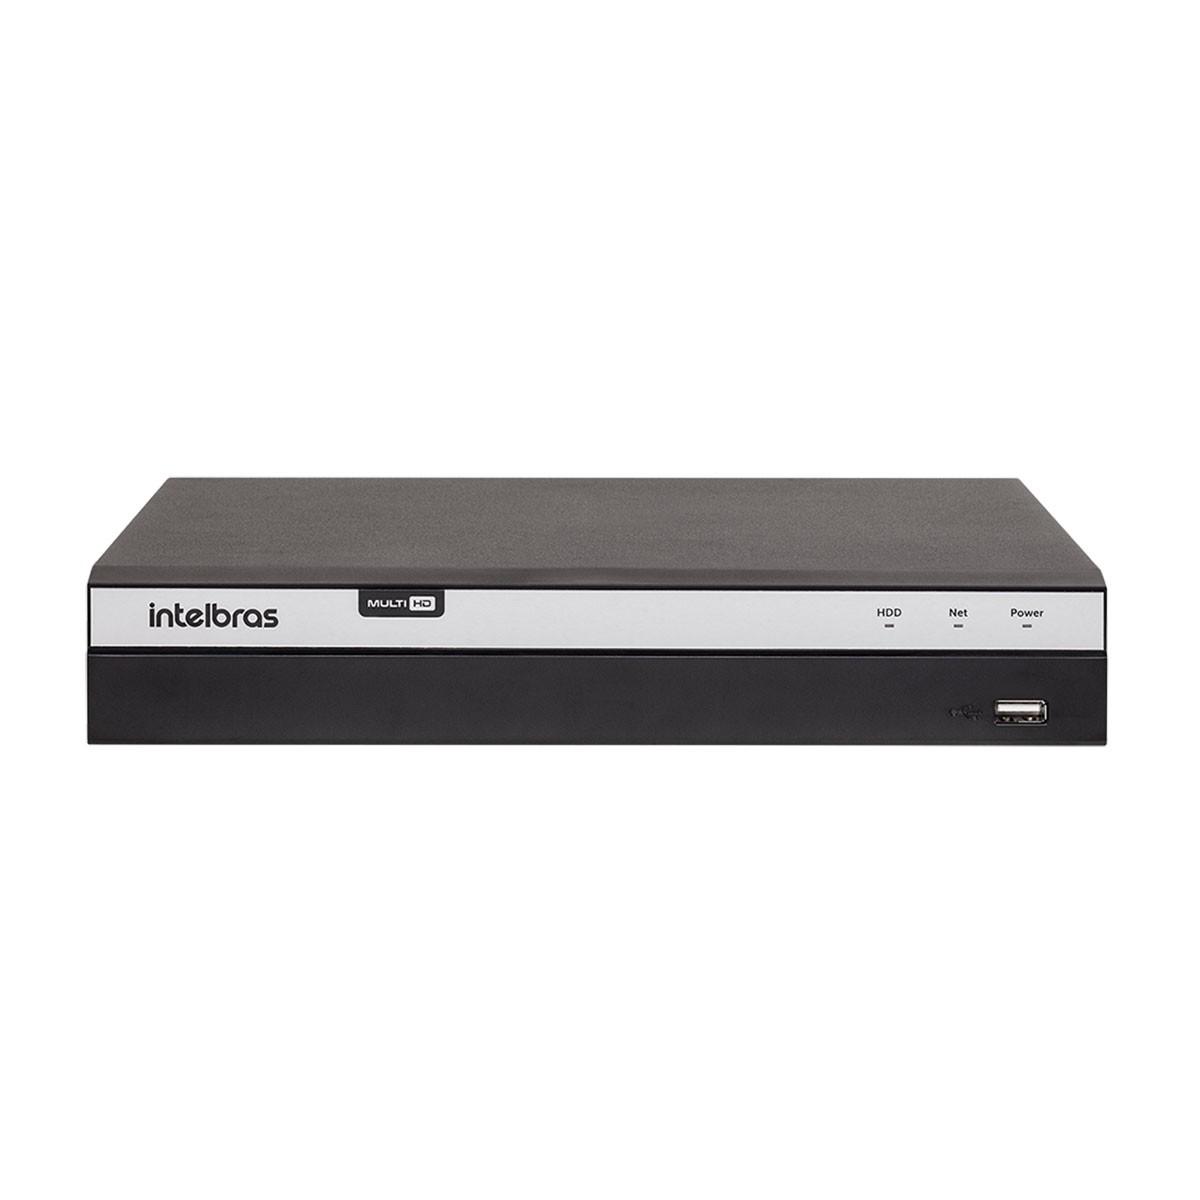 Kit 2 Câmeras de Segurança Full HD 1080p VHD 3230B G4 + DVR Intelbras Full HD + HD WD Purple 1TB + Acessórios  - Tudo Forte